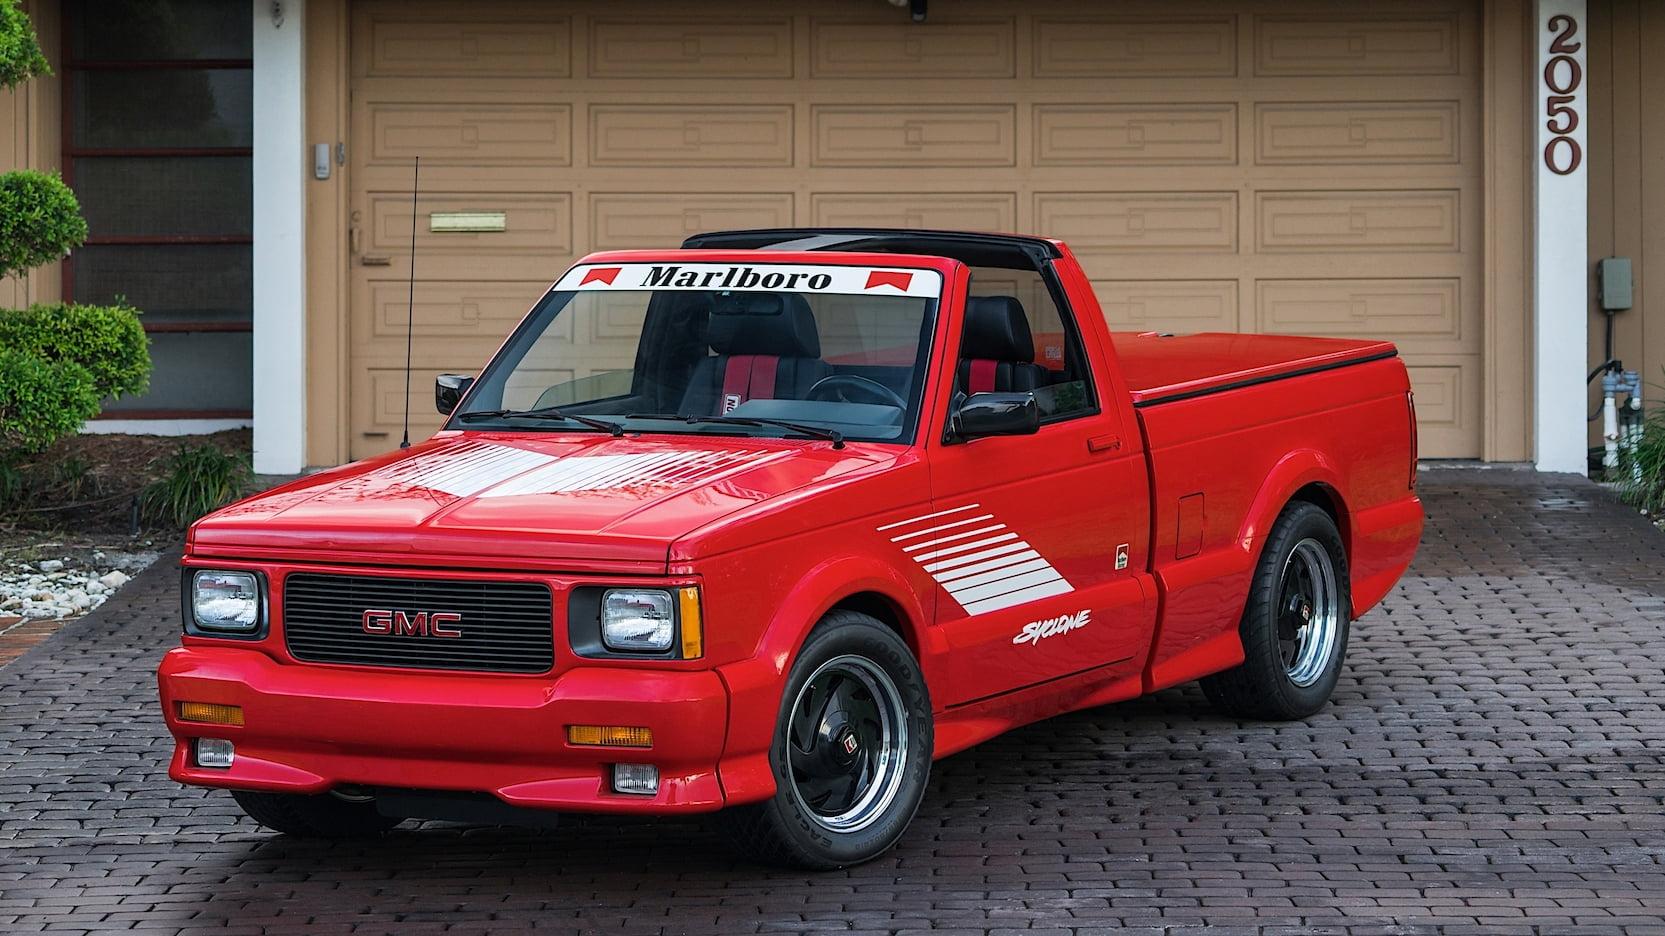 1991 GMC Syclone Marlboro